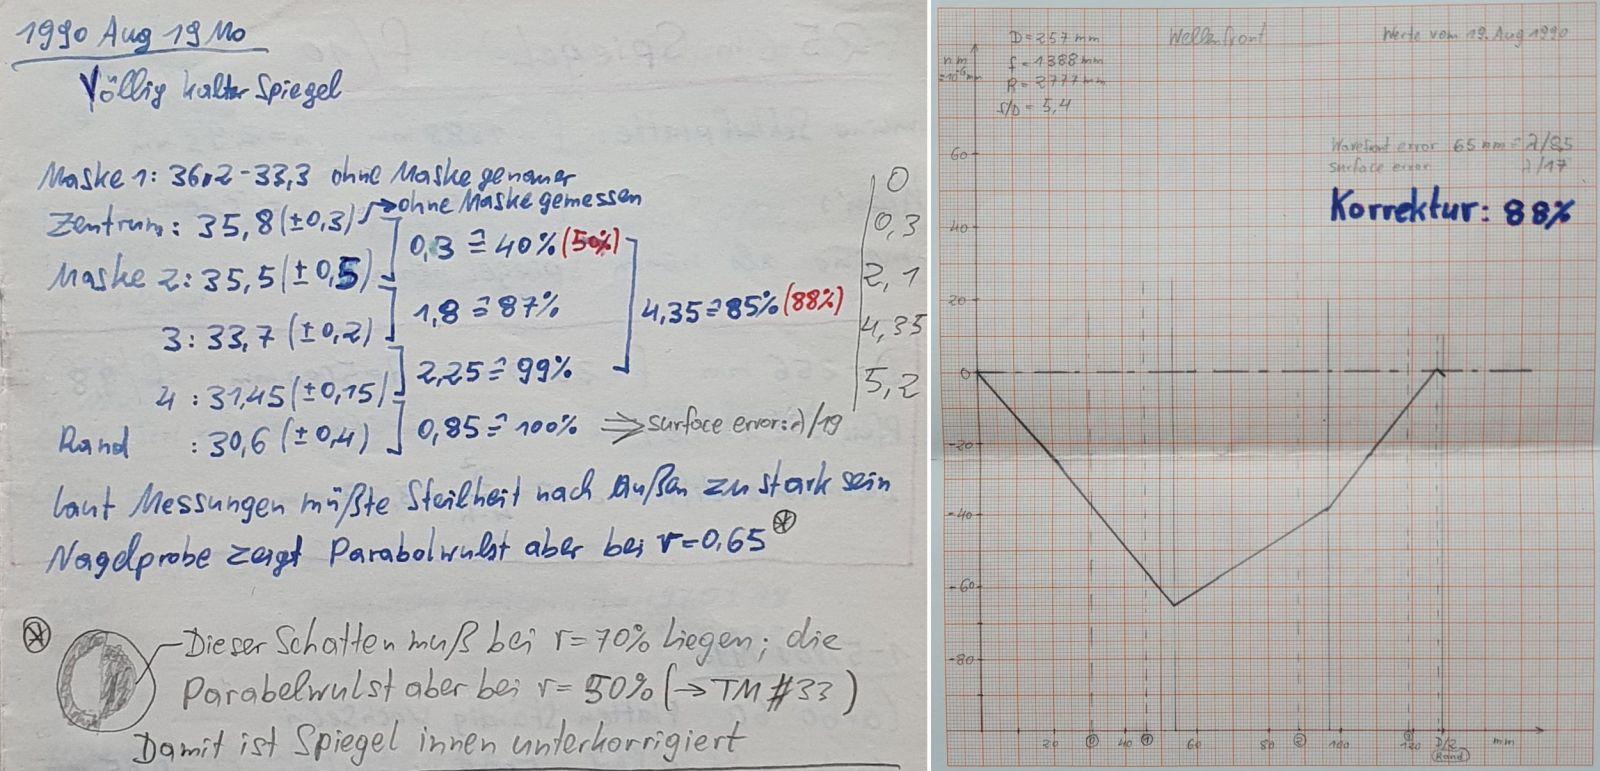 archimedes_25cm_f5.4_protokoll.jpg